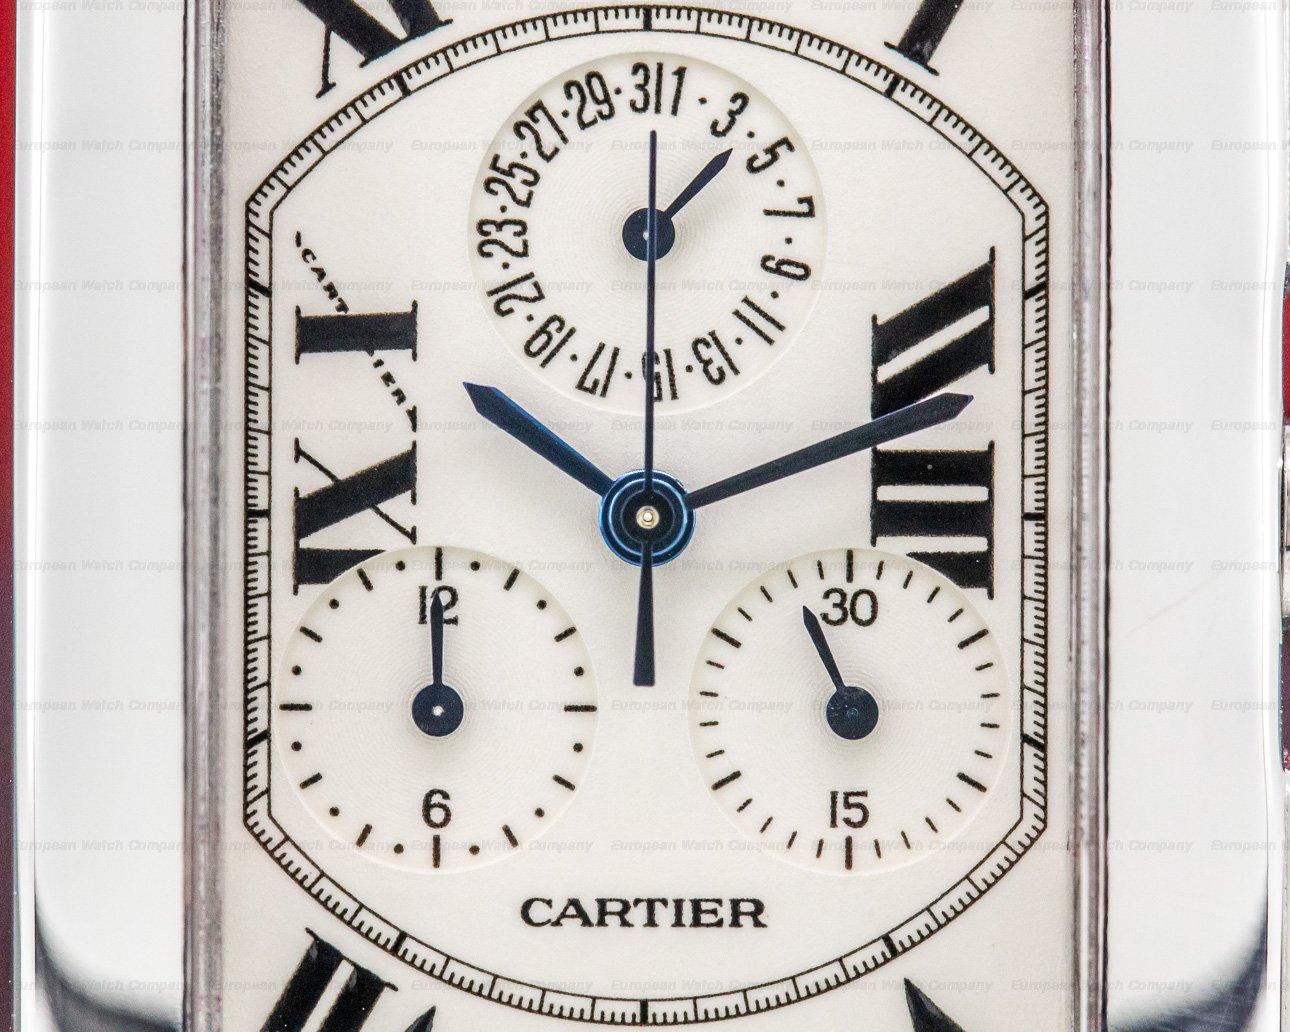 Cartier W26033L1 Tank Americaine Chronograph 18K White Gold / Bracelet